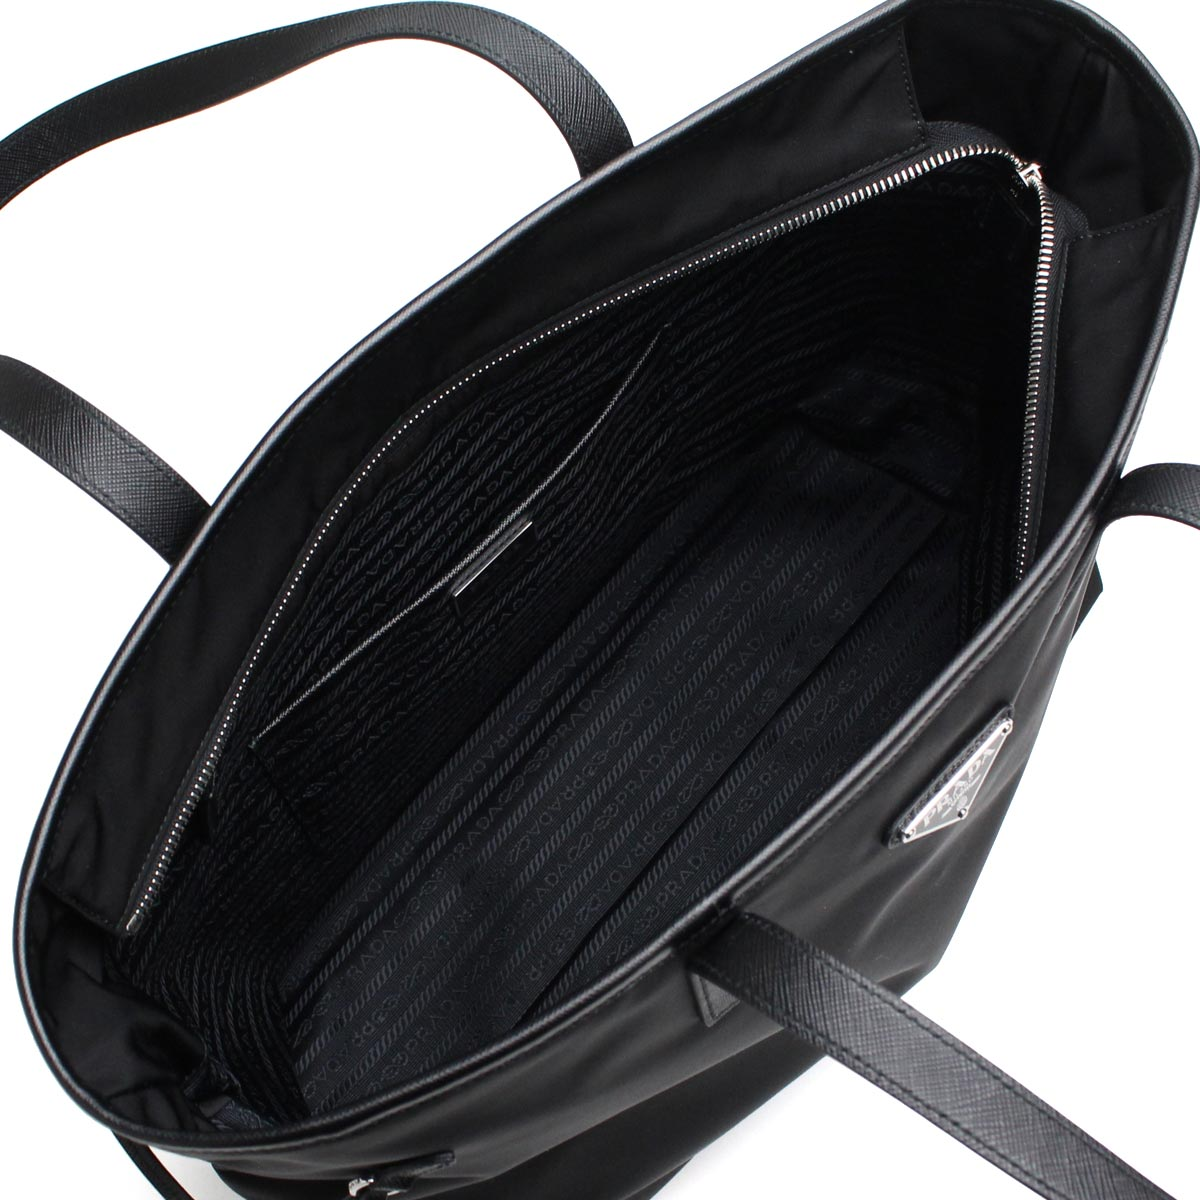 de924597f0f4 Bighit The total brand wholesale  Prada PRADA bag nylon tote bag ...